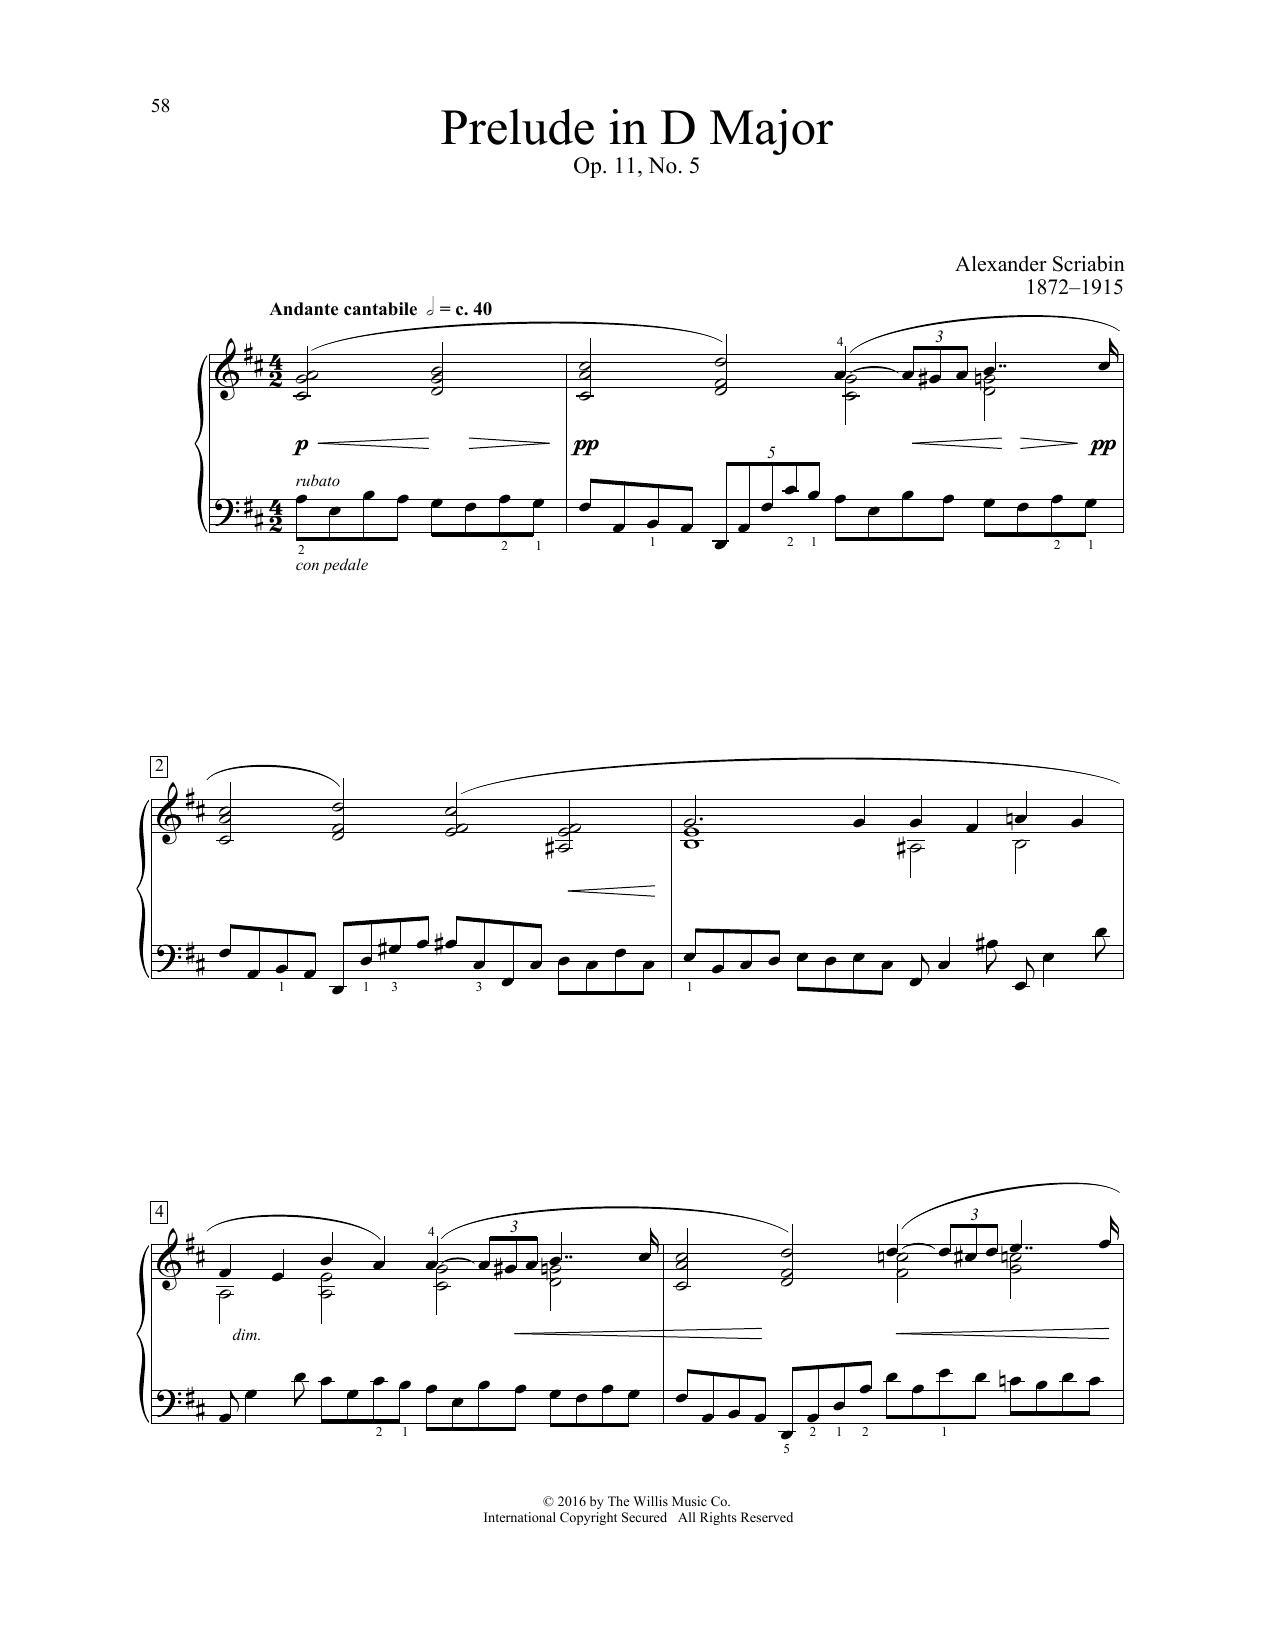 Franz Joseph Haydn Sonata In D Major, Hob. XVI:4, 1st Mvmt sheet music notes and chords. Download Printable PDF.